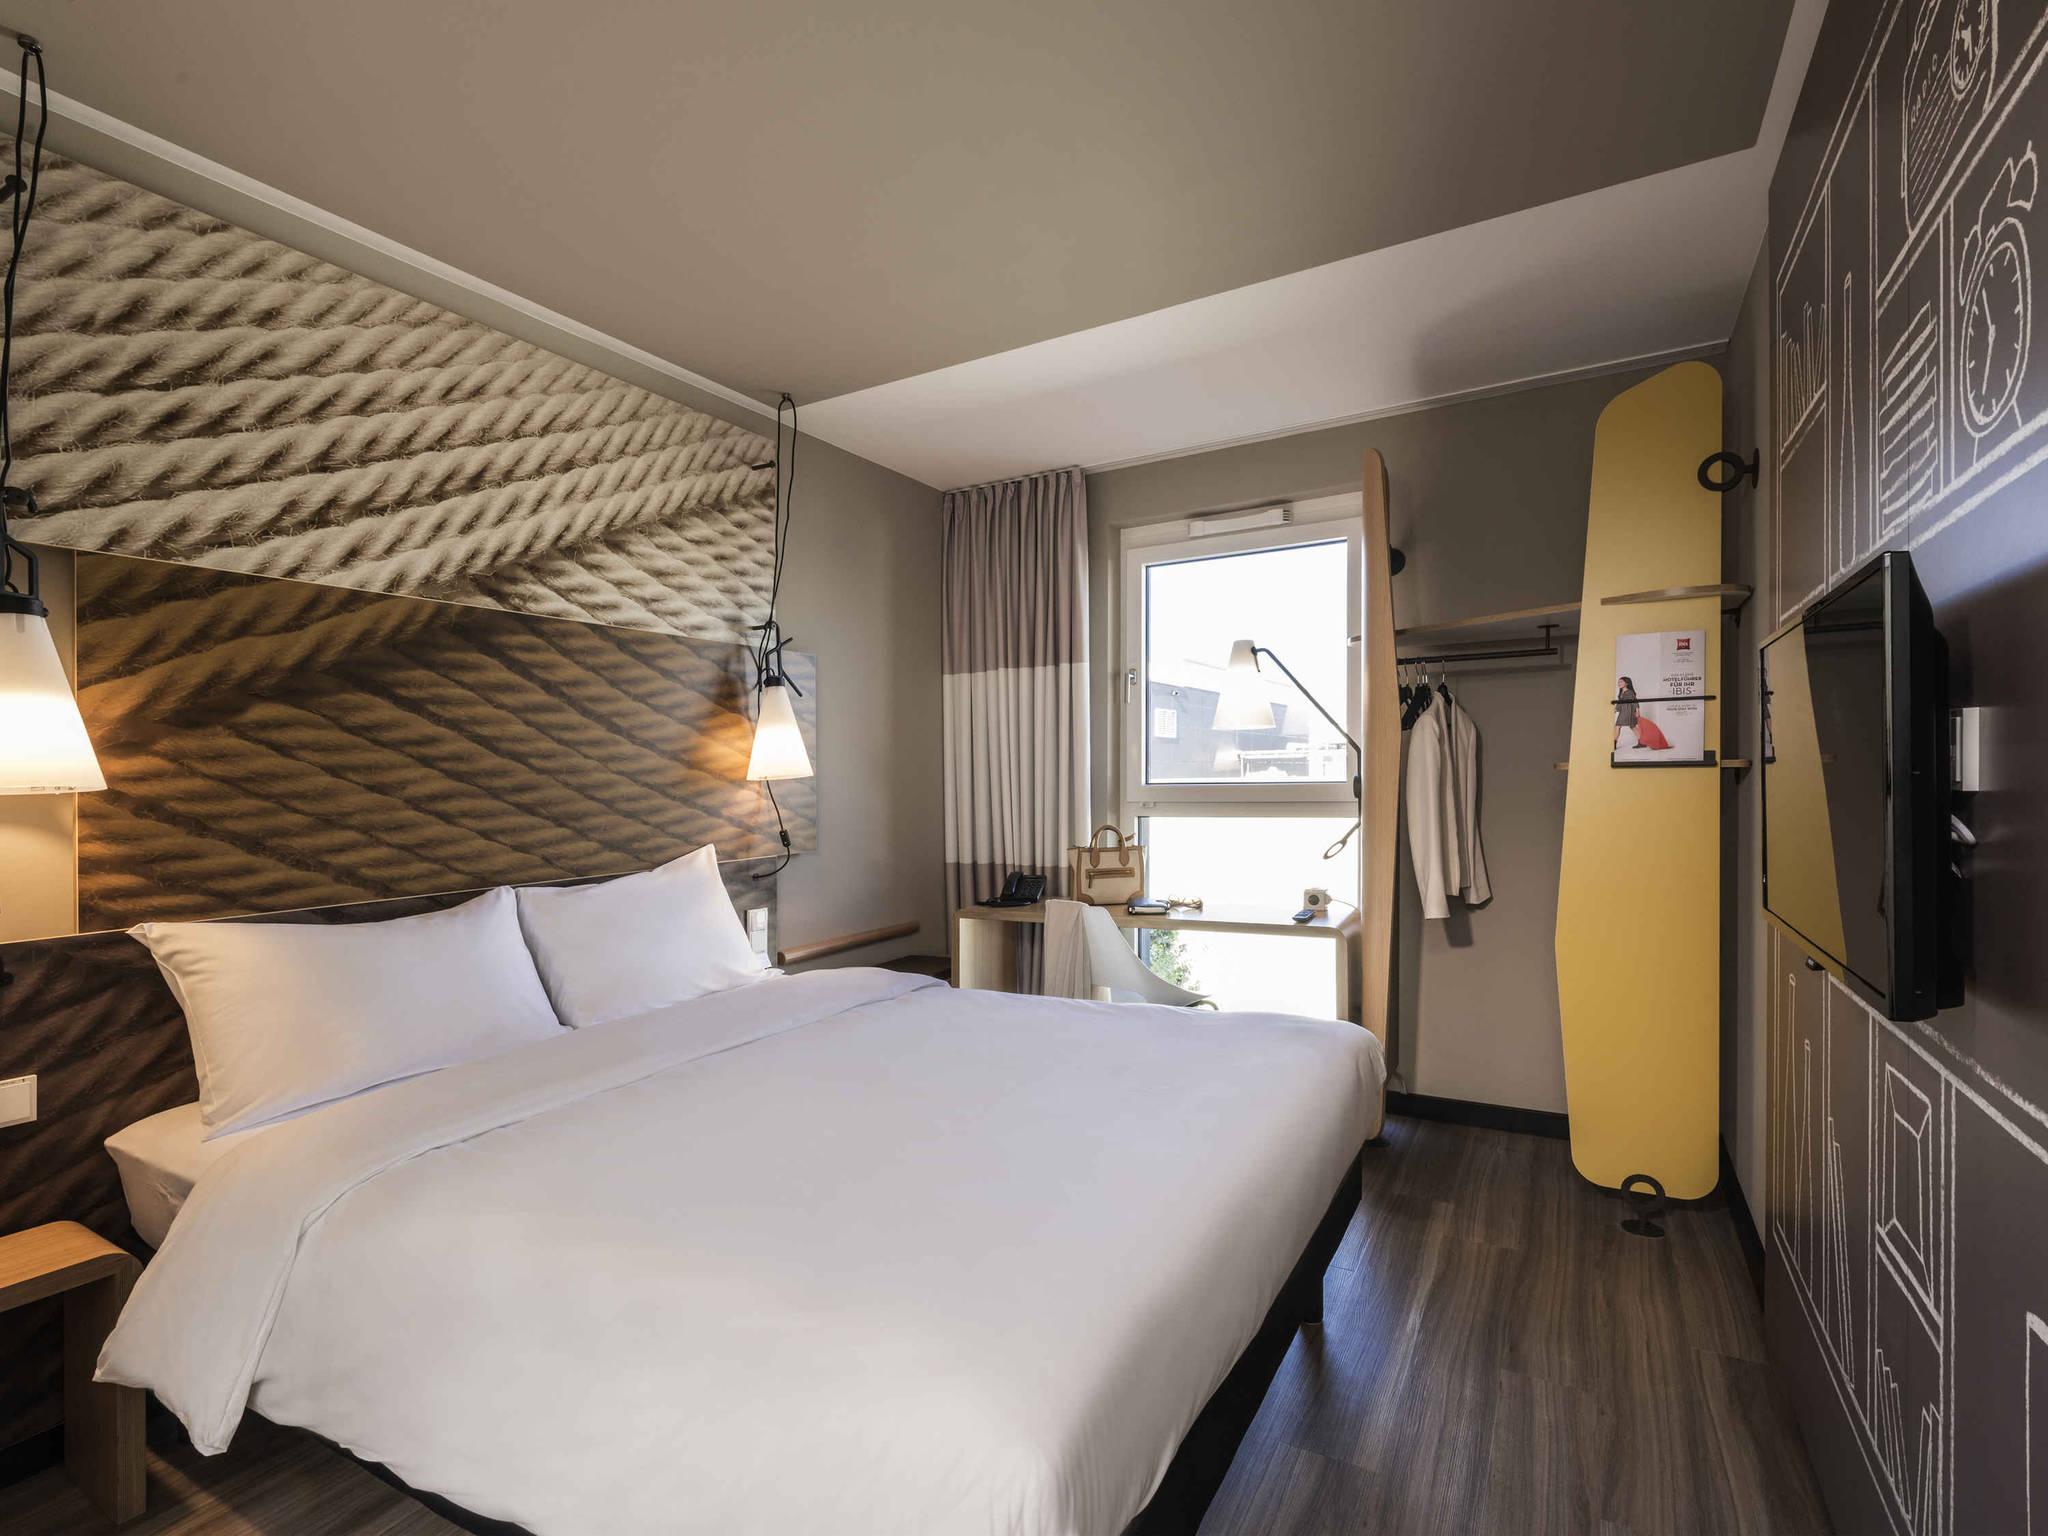 Hotell I Muenchen  U2013 Ibis Muenchen City Ost